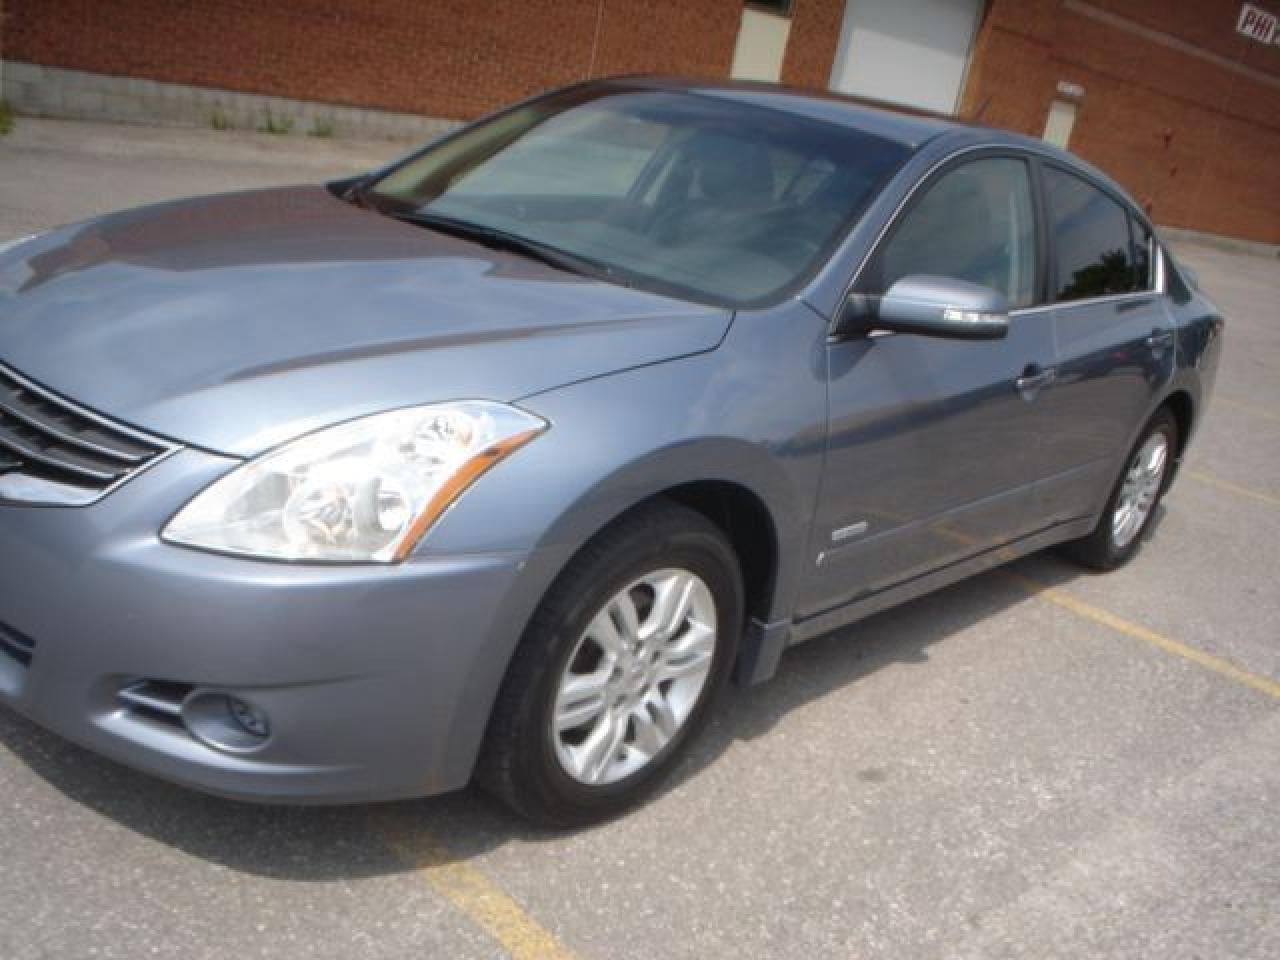 2010 Nissan Altima hybrid,navi.,leather,auto,sunroof